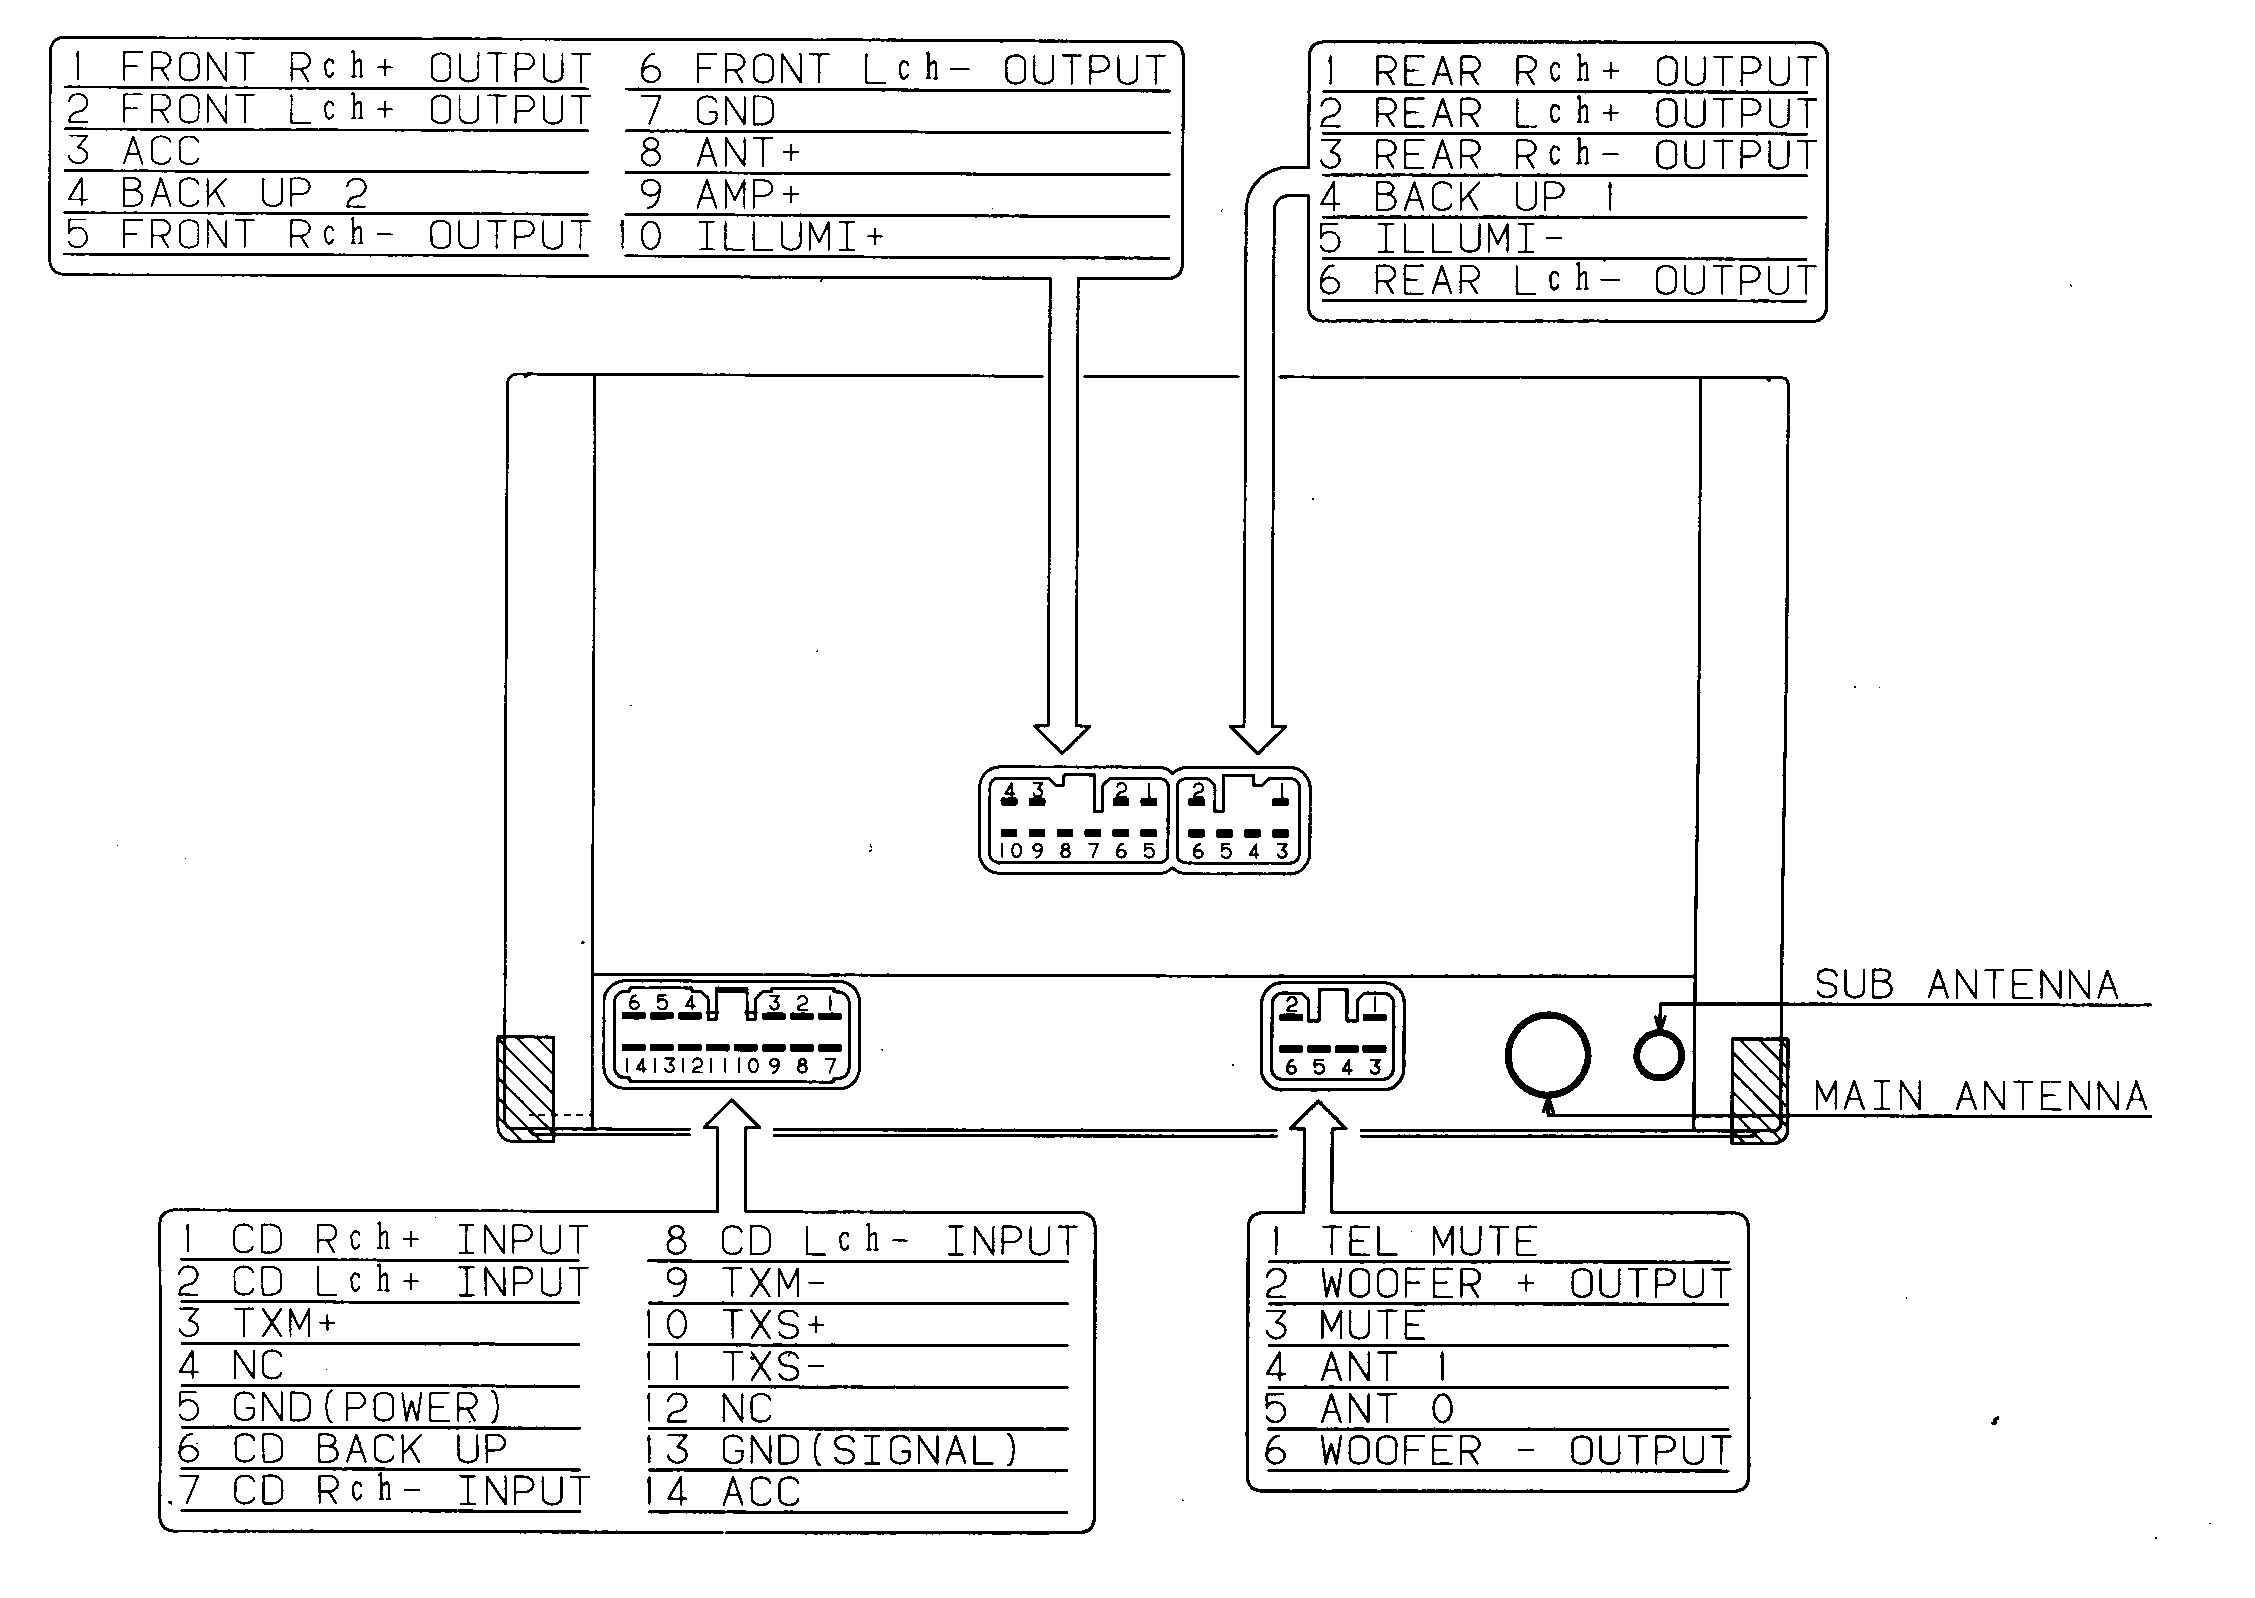 Wiring Diagram for Car Amplifier Car Audio Wire Diagram Codes Lexus Factory Stereo Repair Amazing Of Wiring Diagram for Car Amplifier